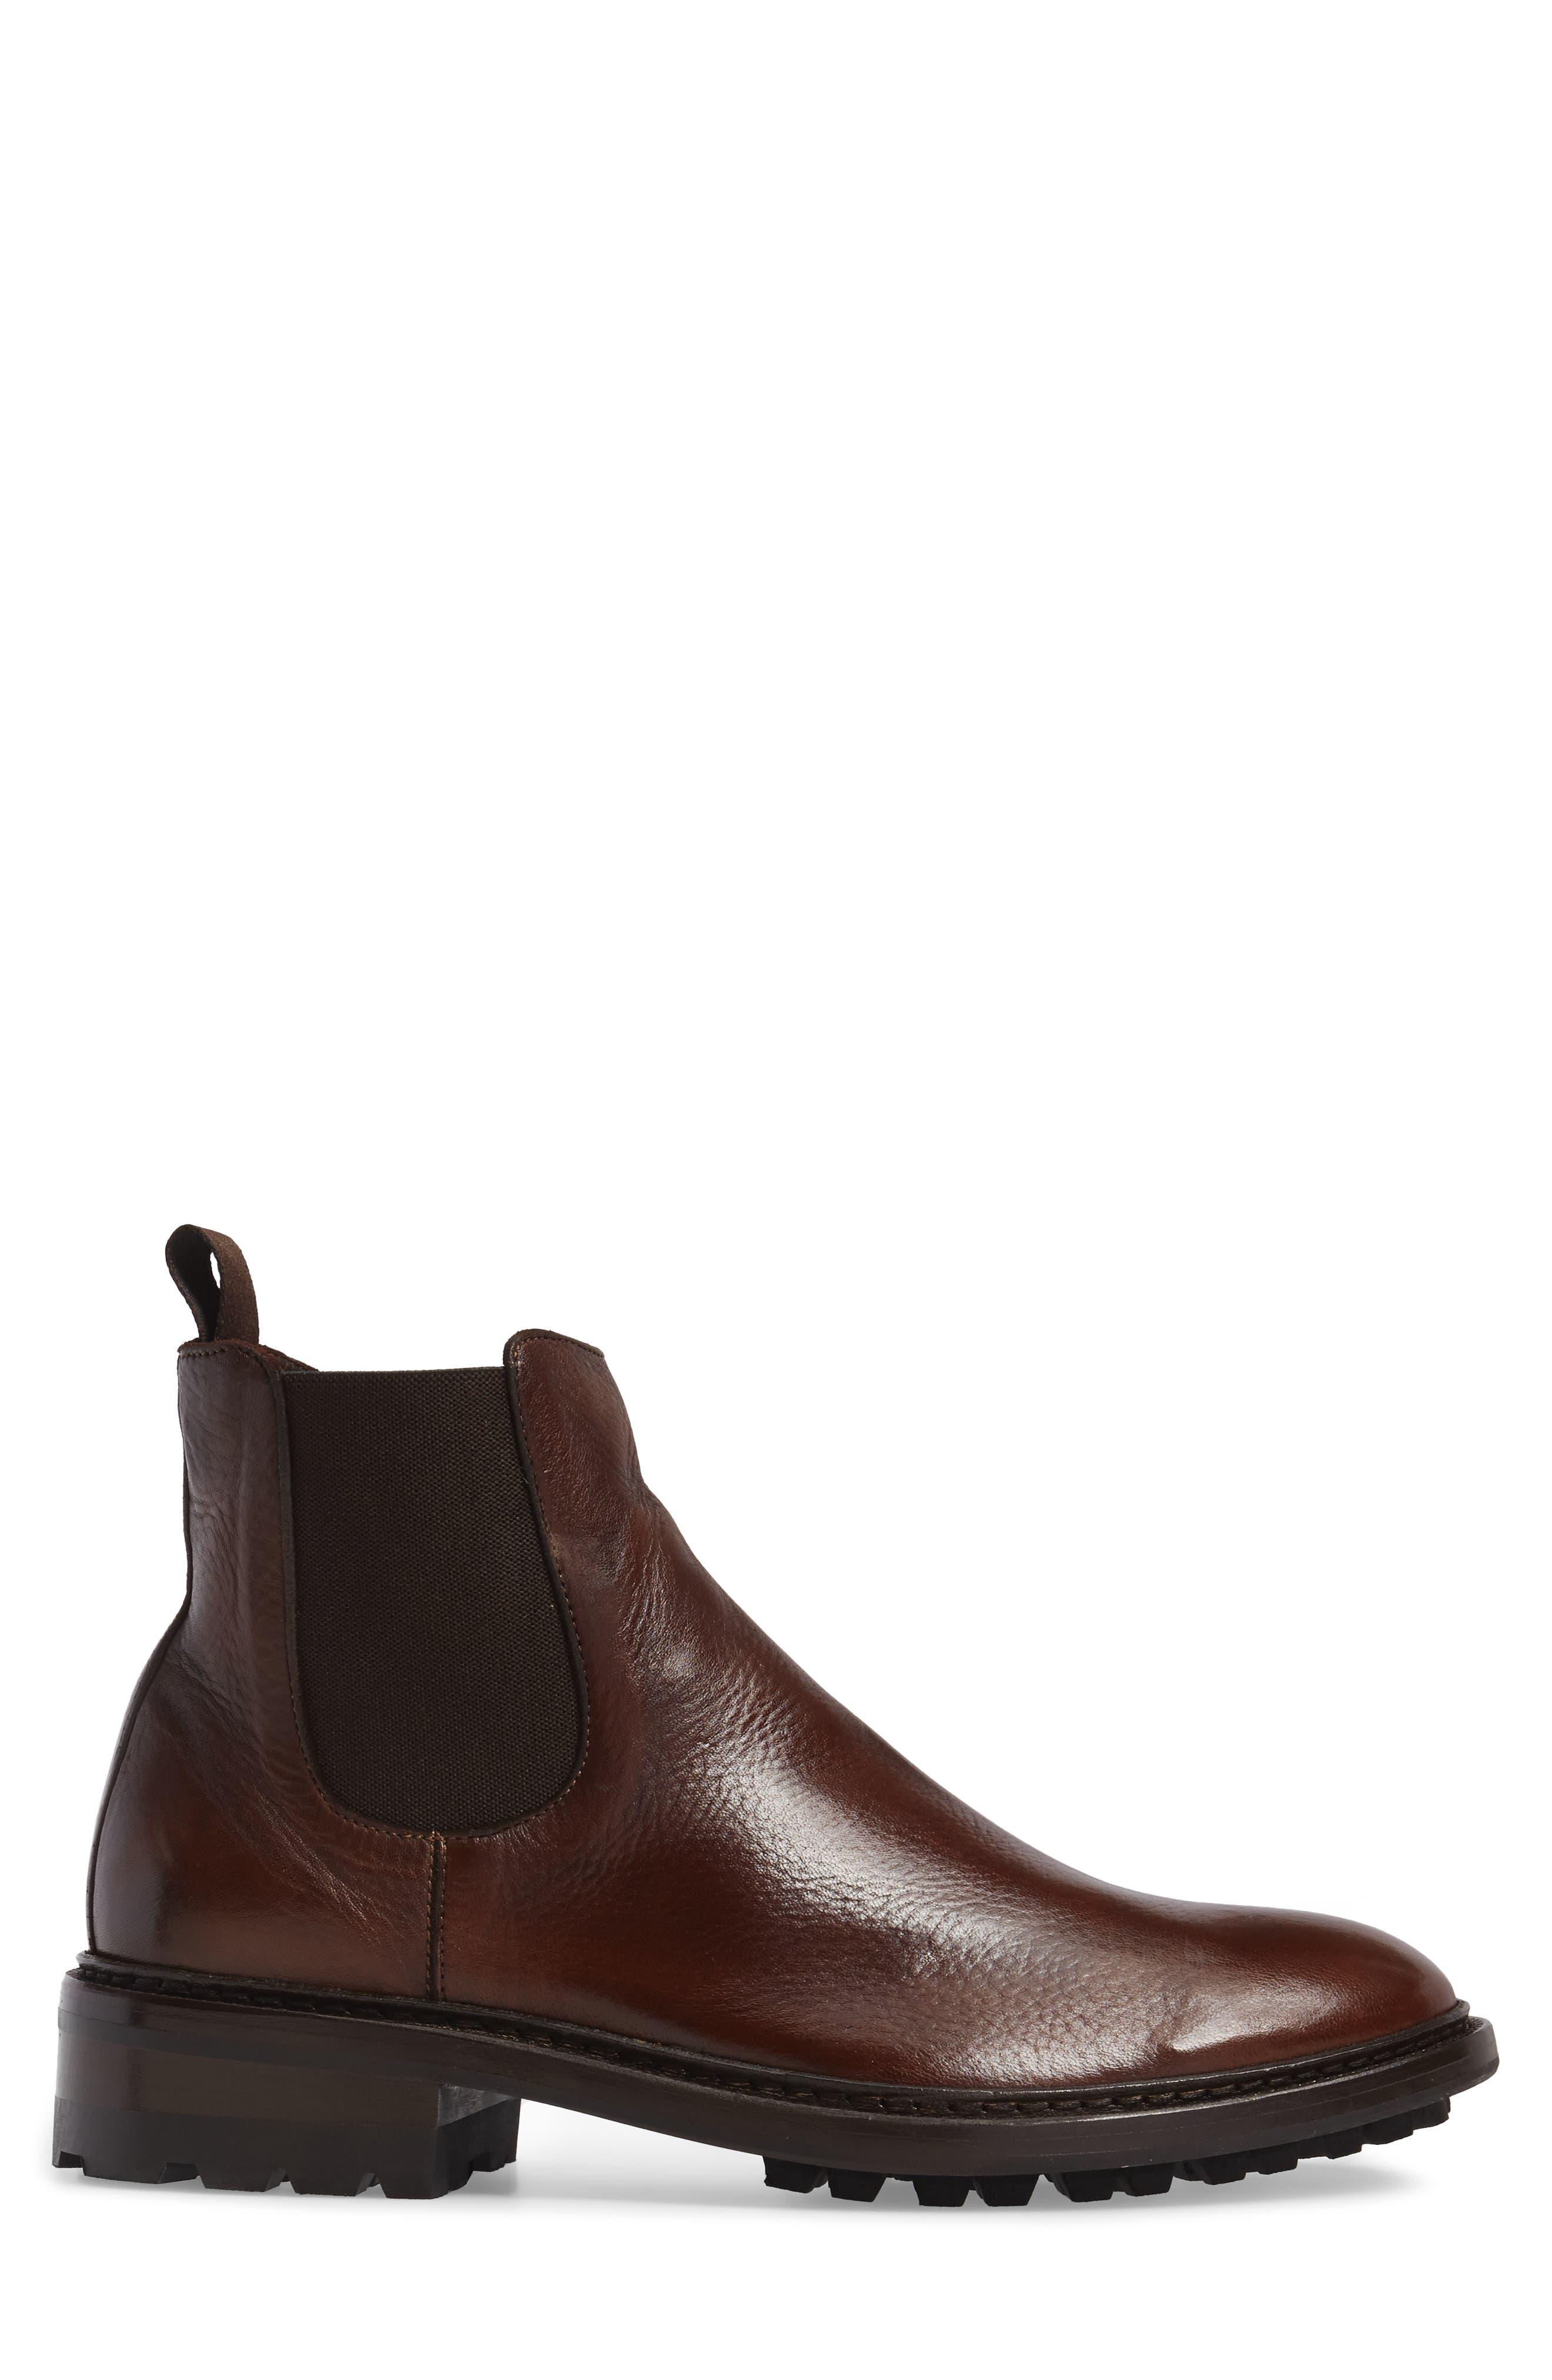 Greyson Chelsea Boot,                             Alternate thumbnail 3, color,                             COGNAC